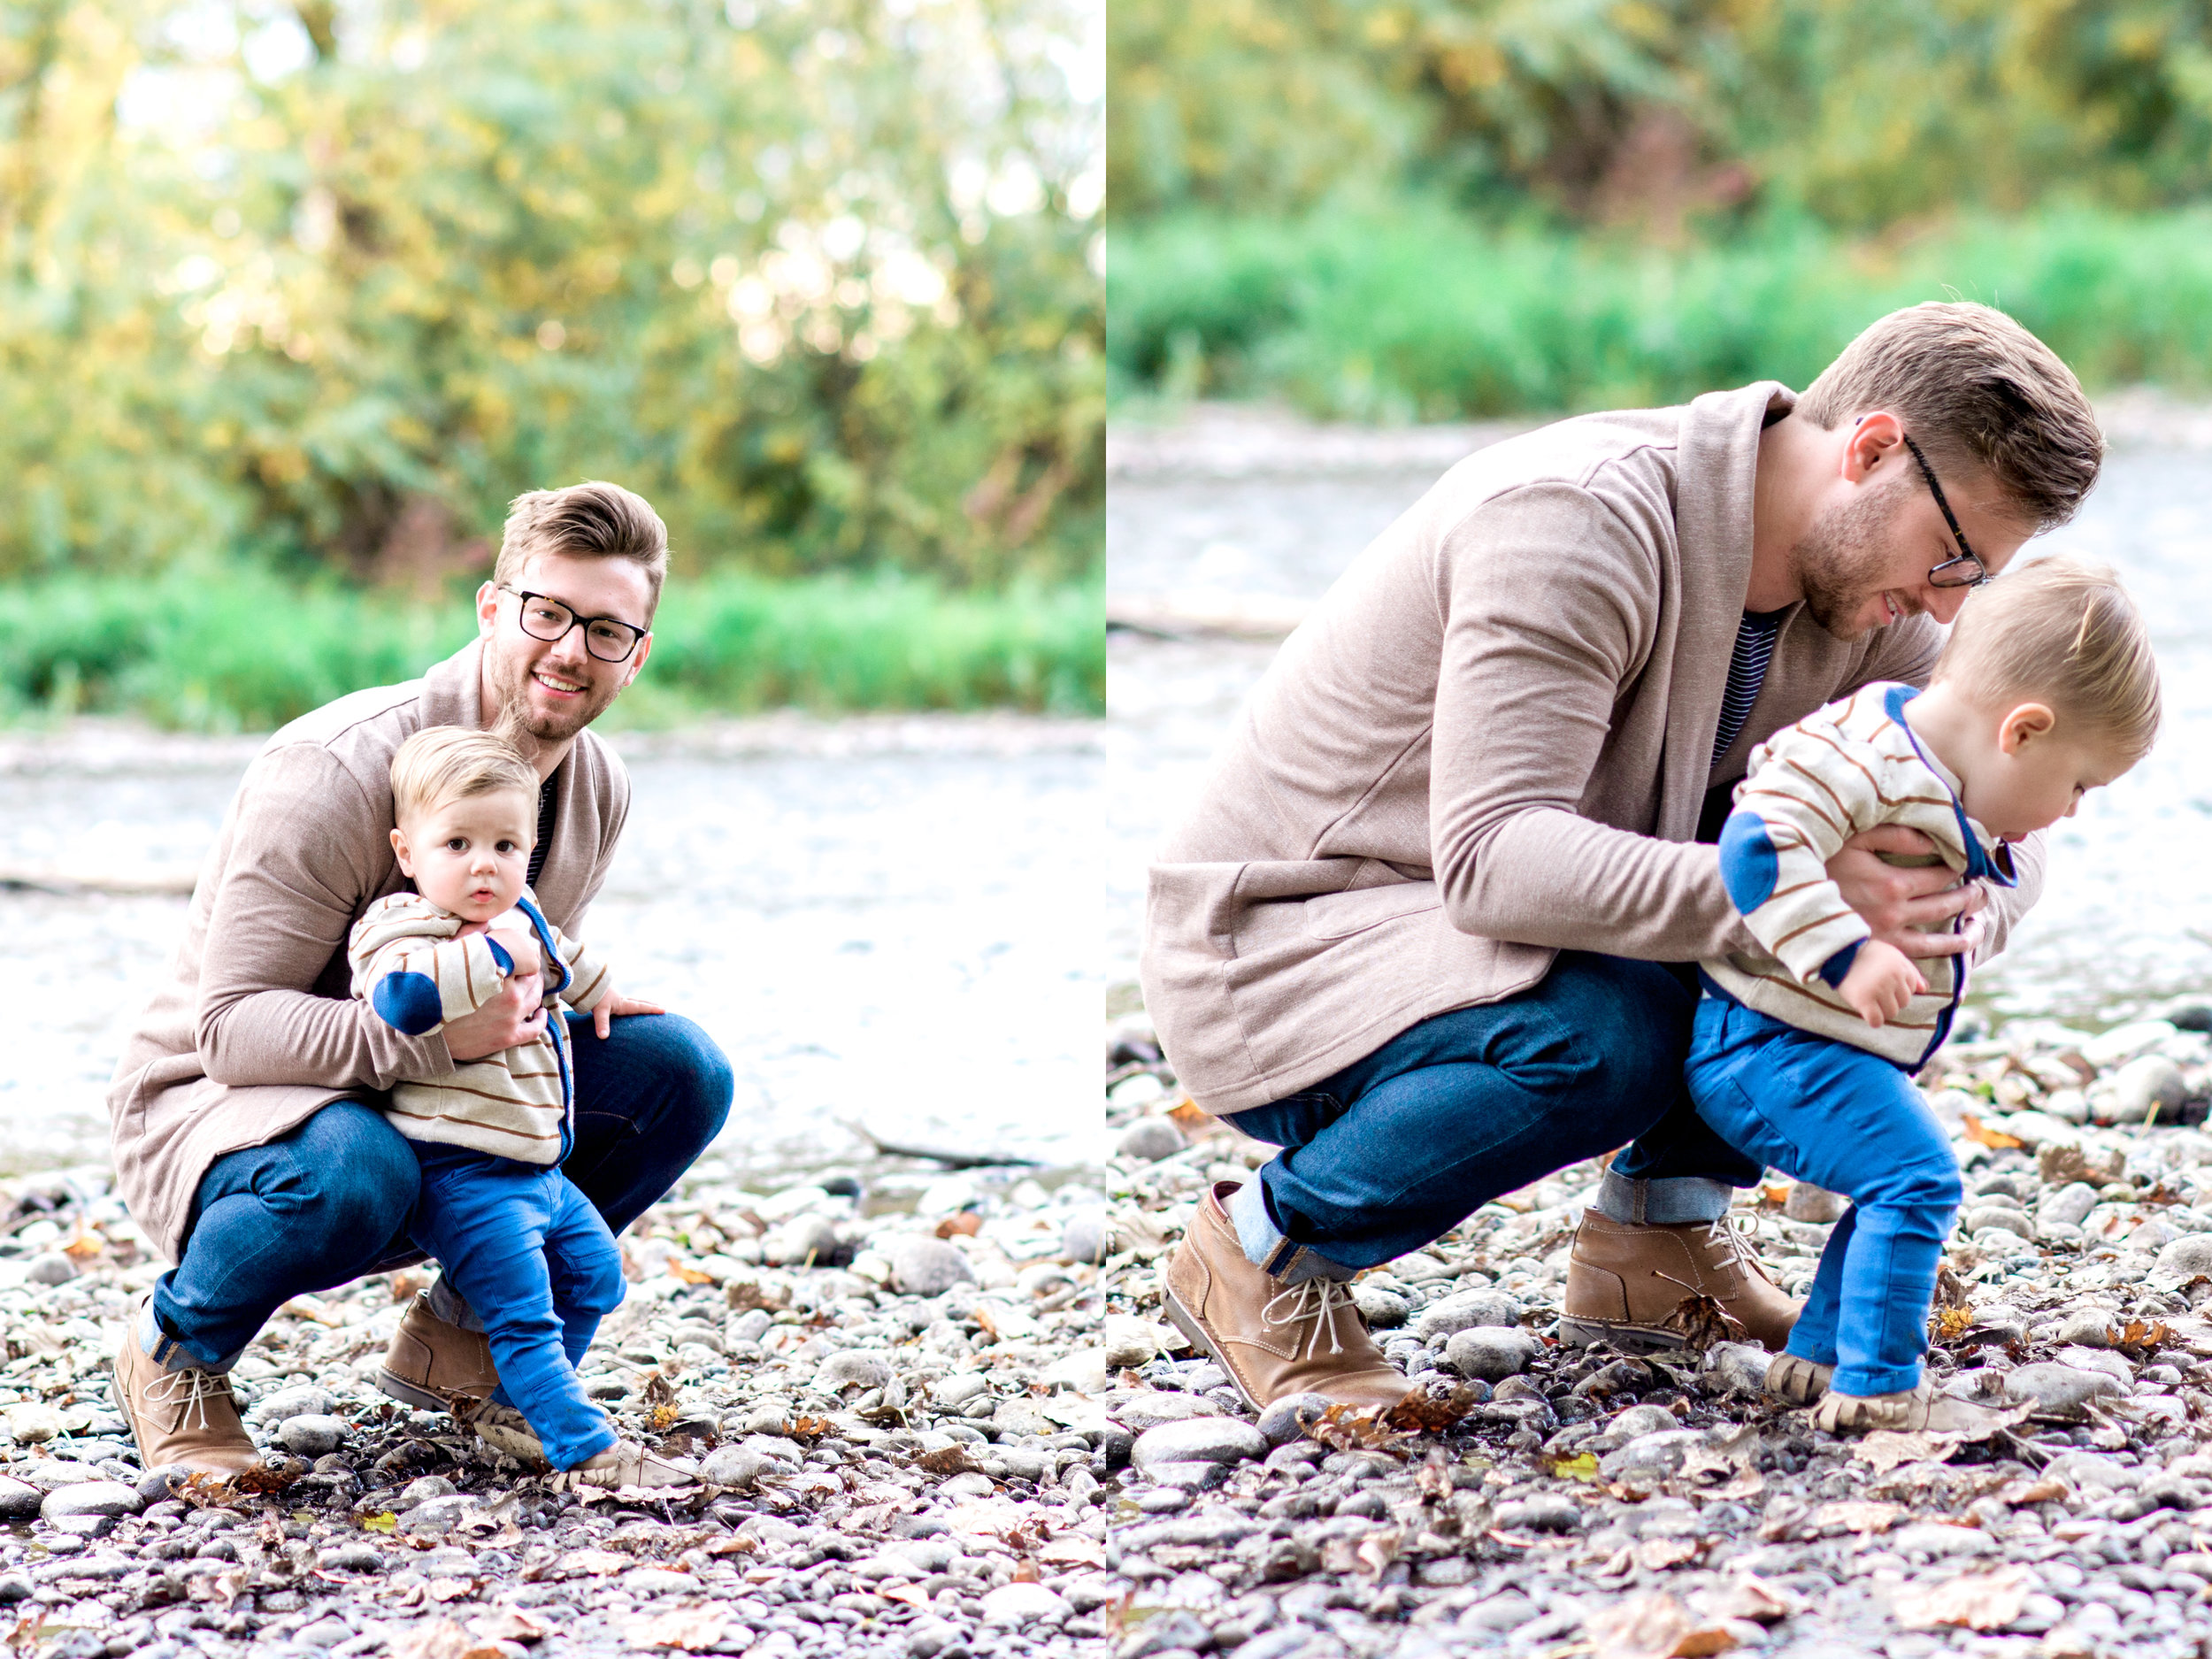 Natalie Koziuk Photography | Boise, ID Wedding Photographer | Boise, ID Lifestyle Photographer | family | www.nkoziukphotography.com